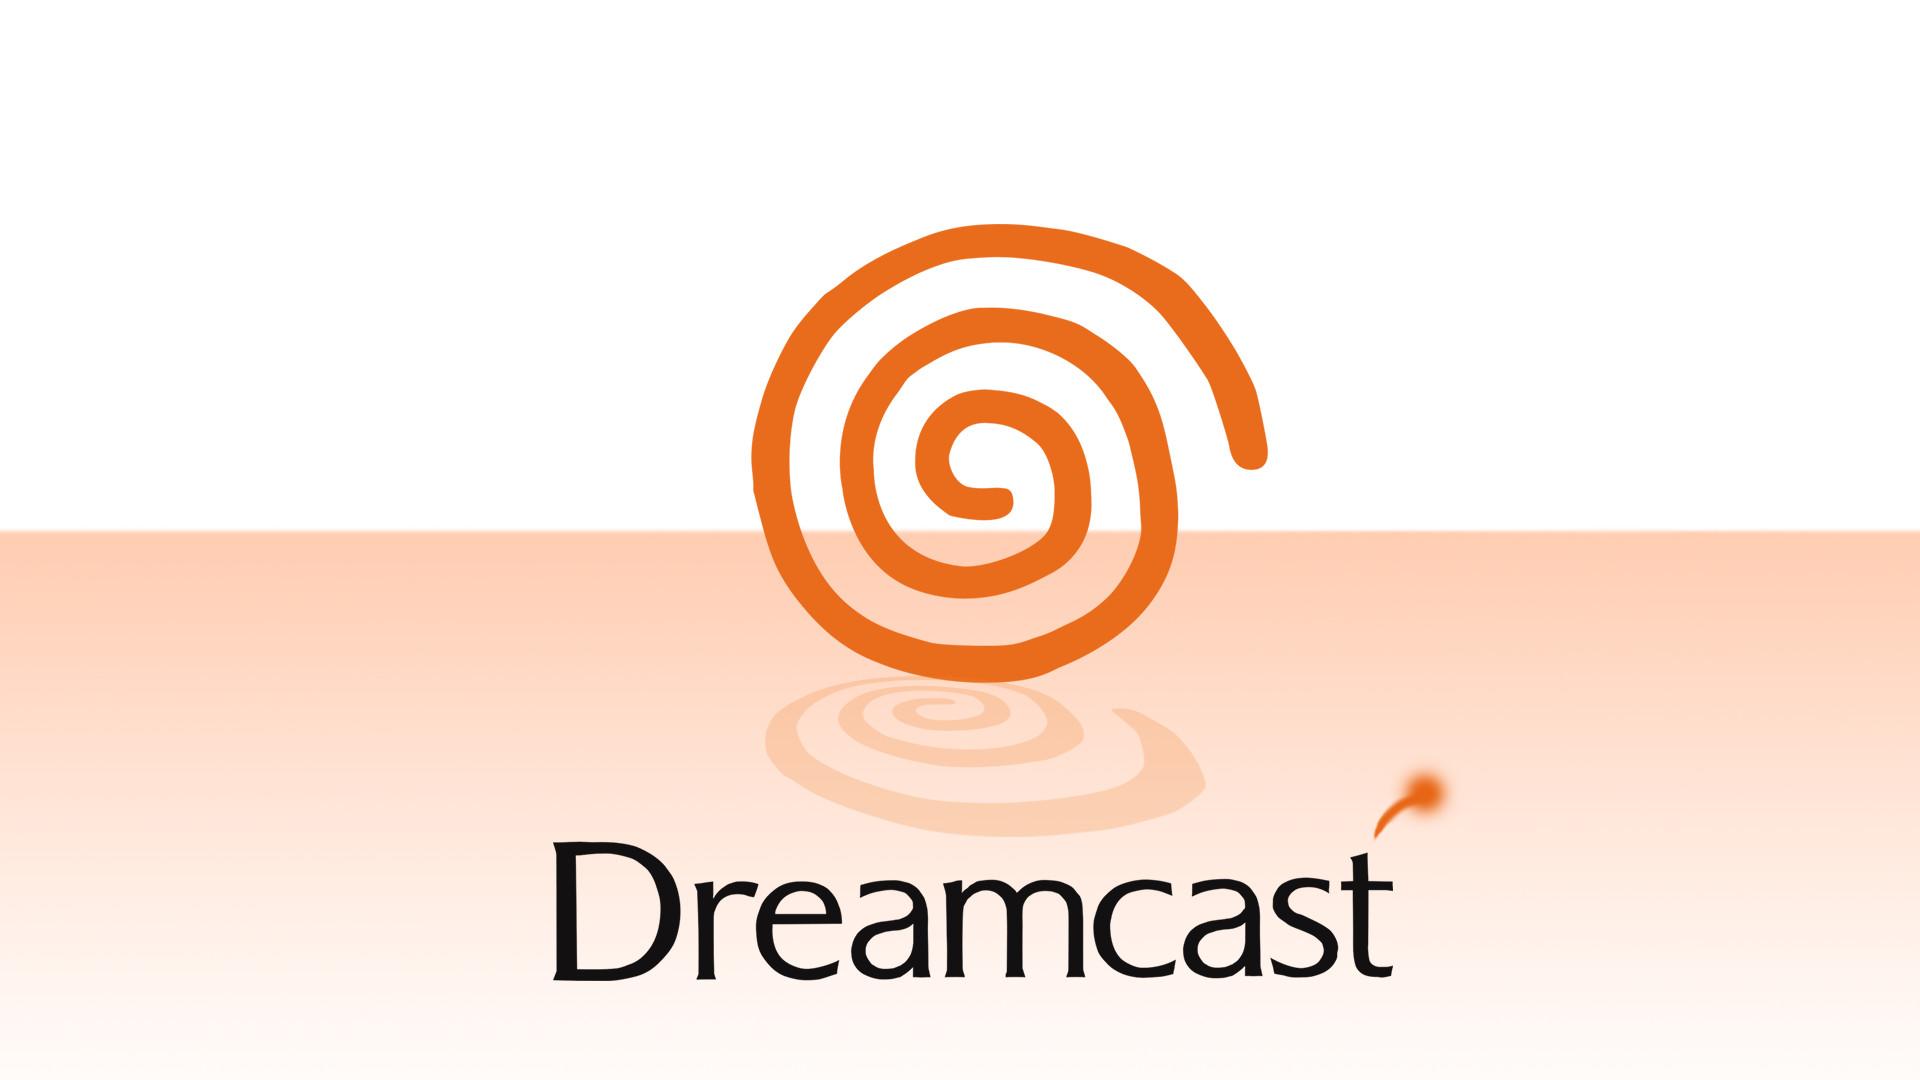 … Sega Dreamcast Wallpaper [1080p] by RamtroStudios